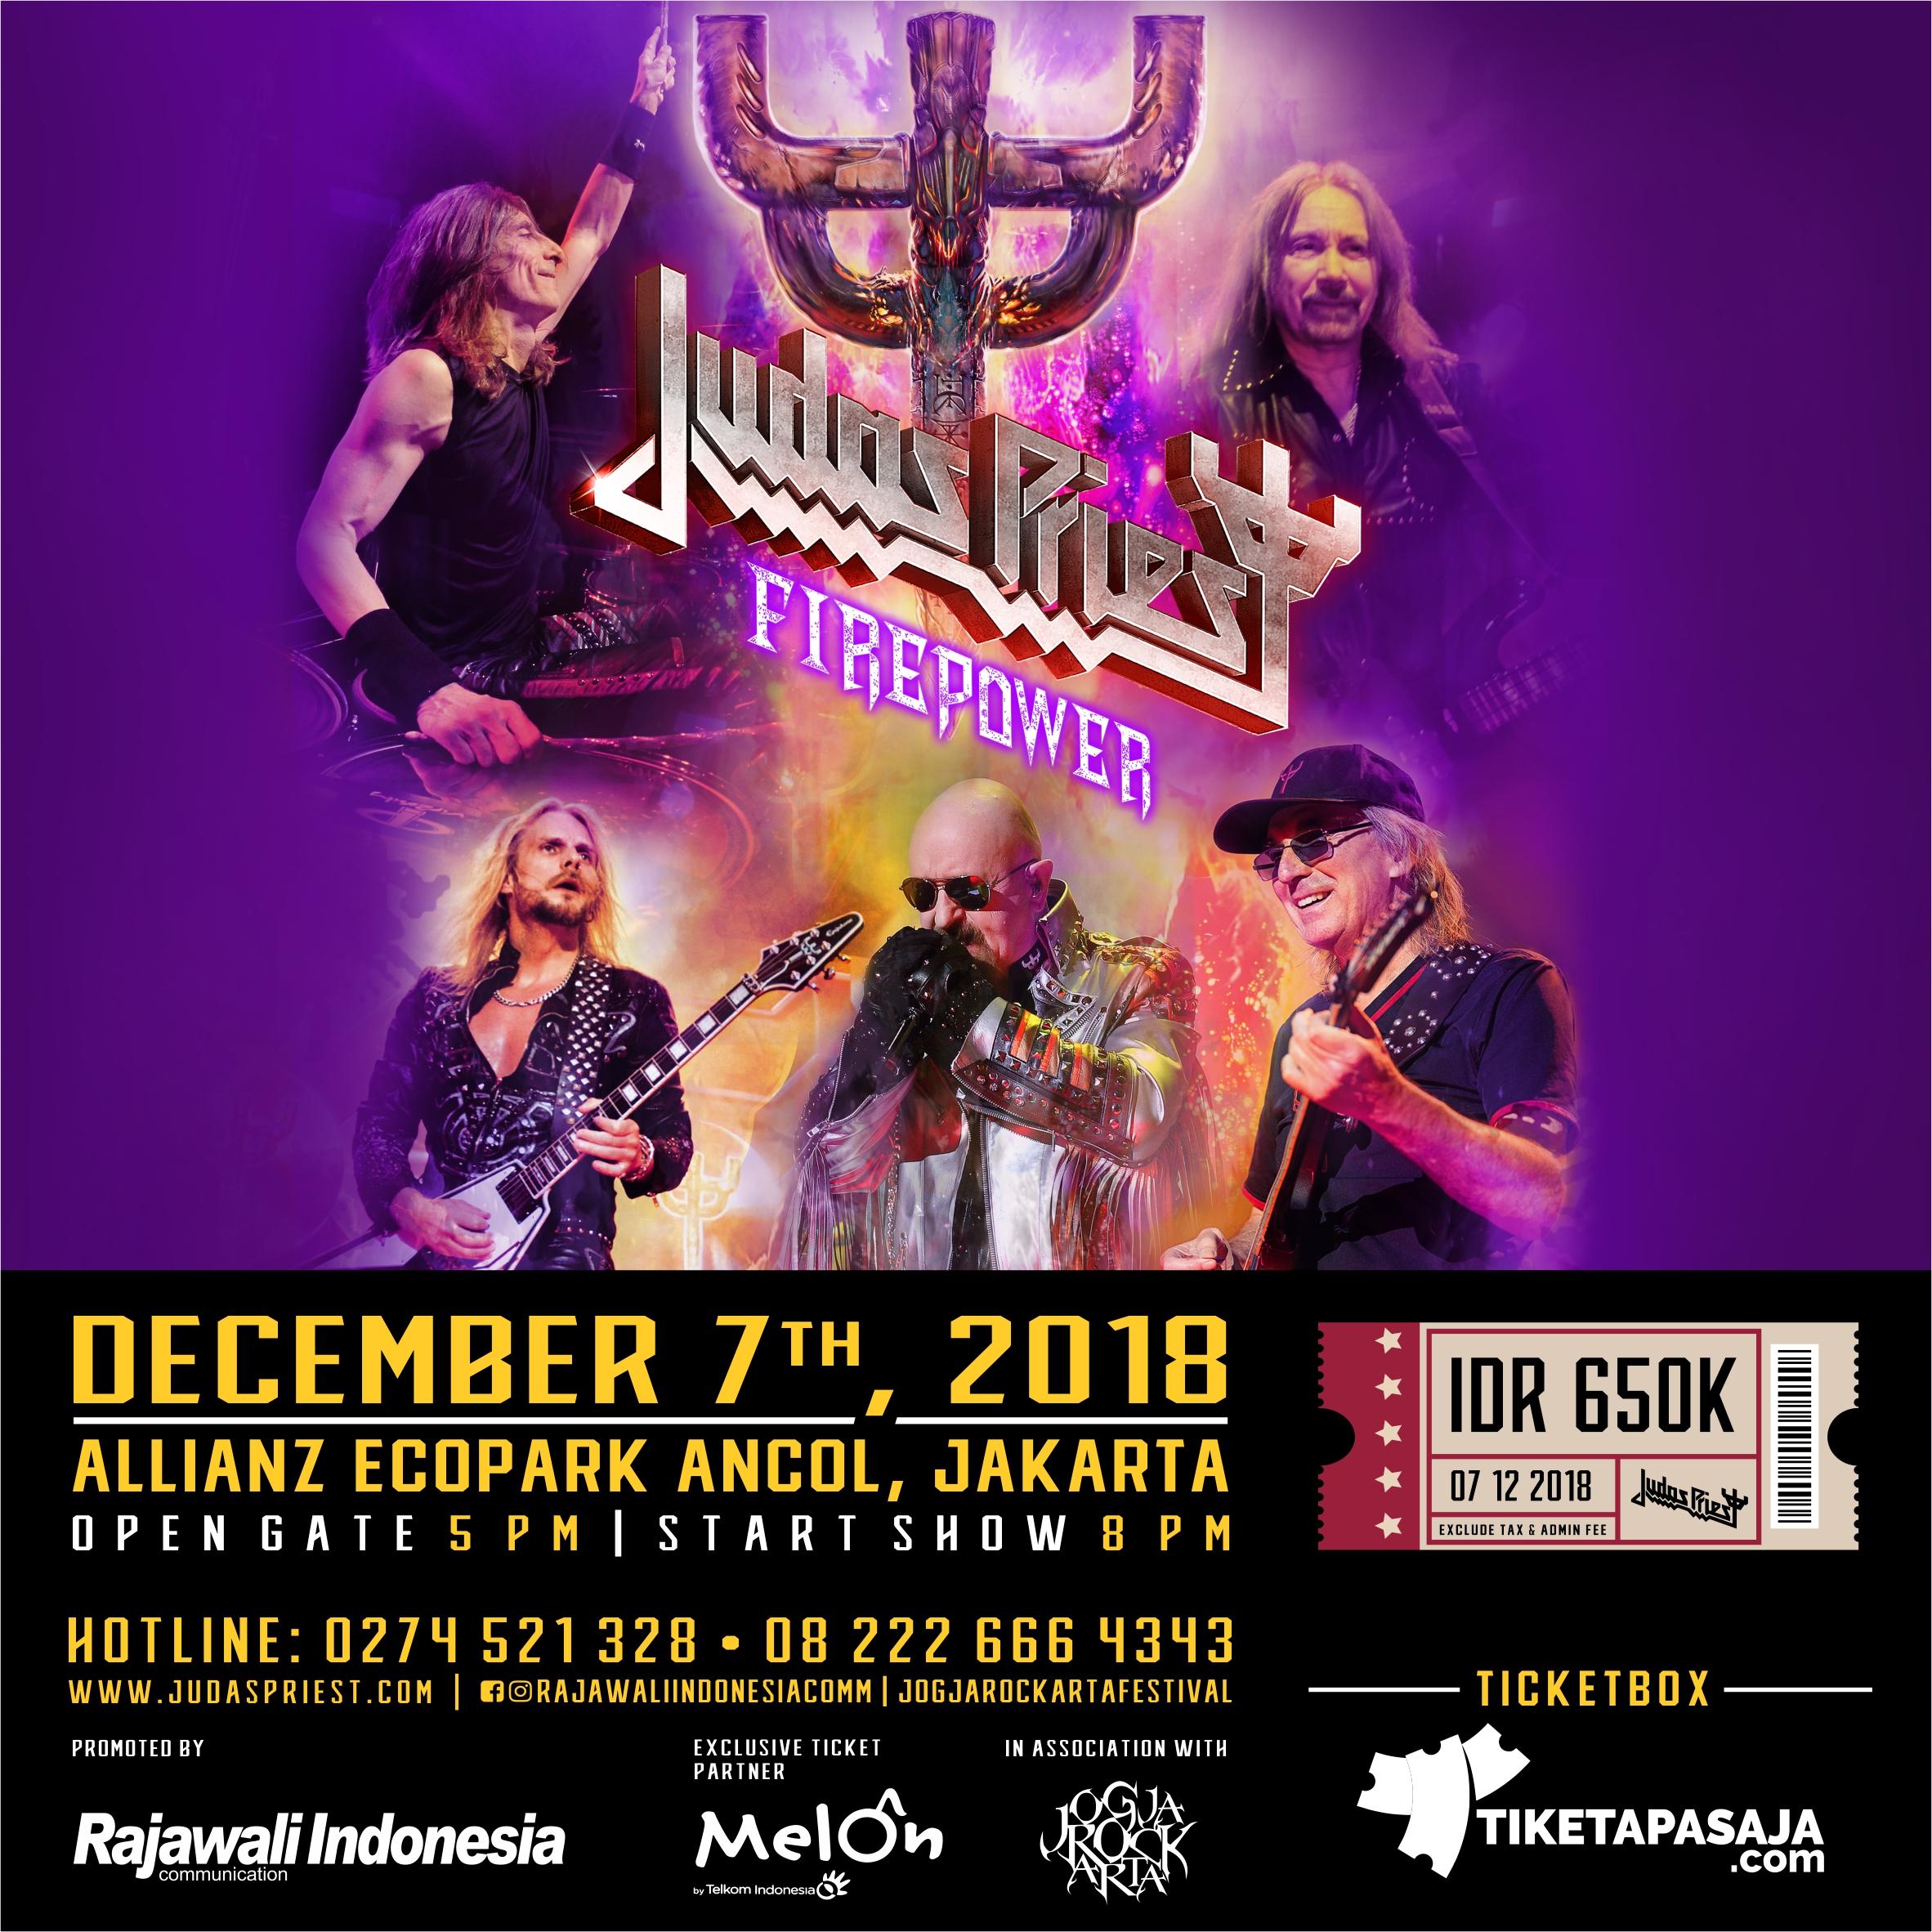 Judas Priest Live in Concert Ecopark Ancol Jakarta